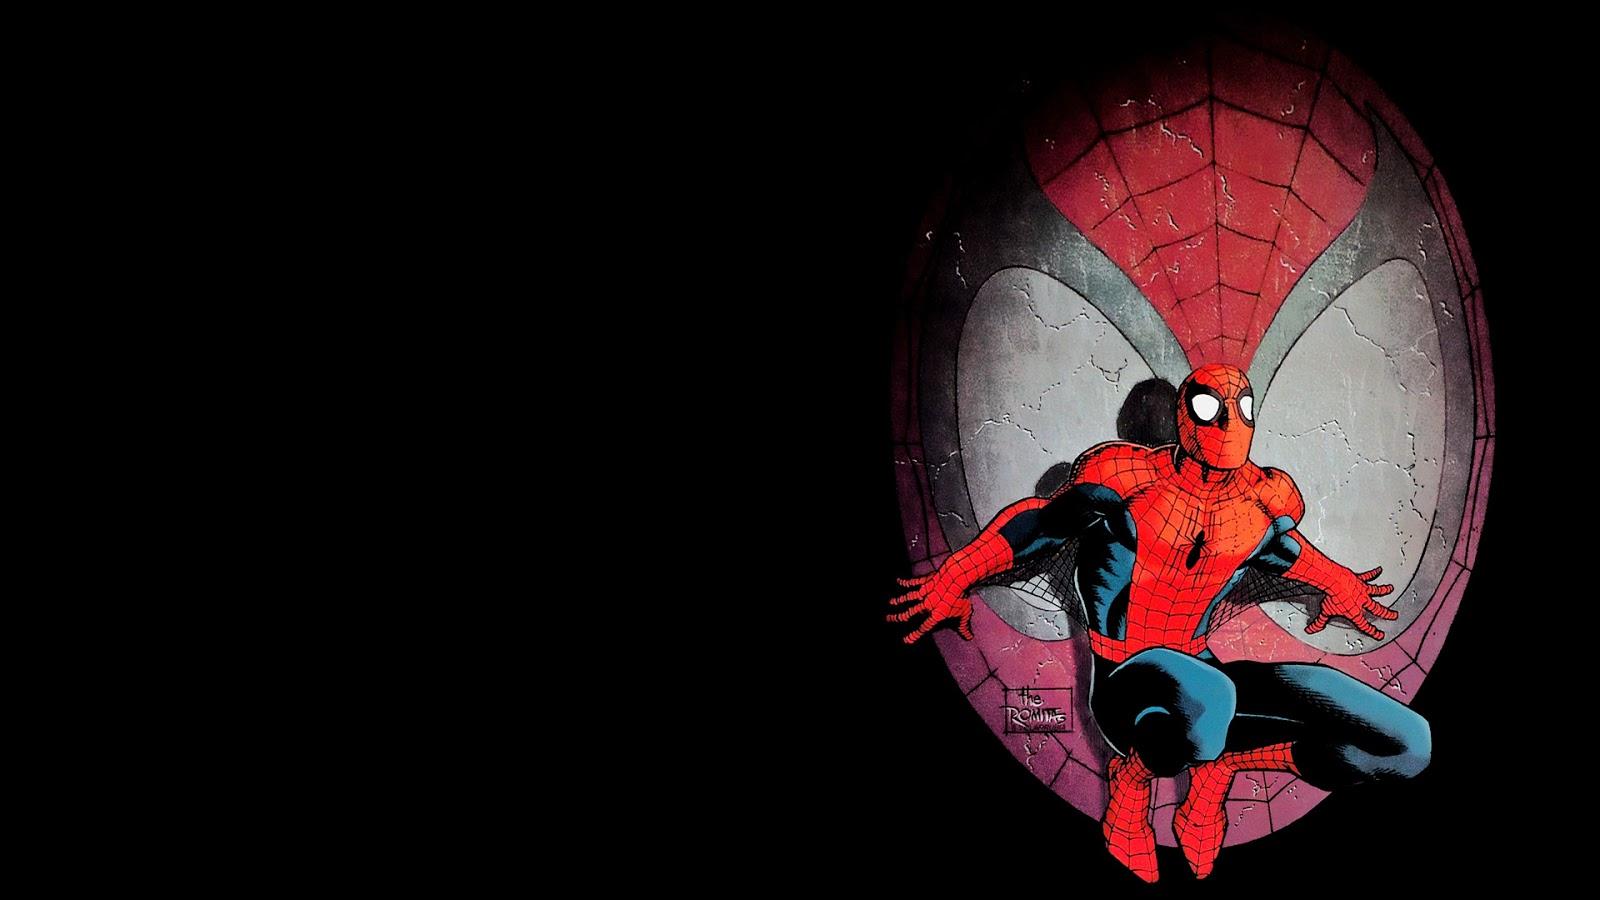 Spiderman Wallpaper HD Desktop